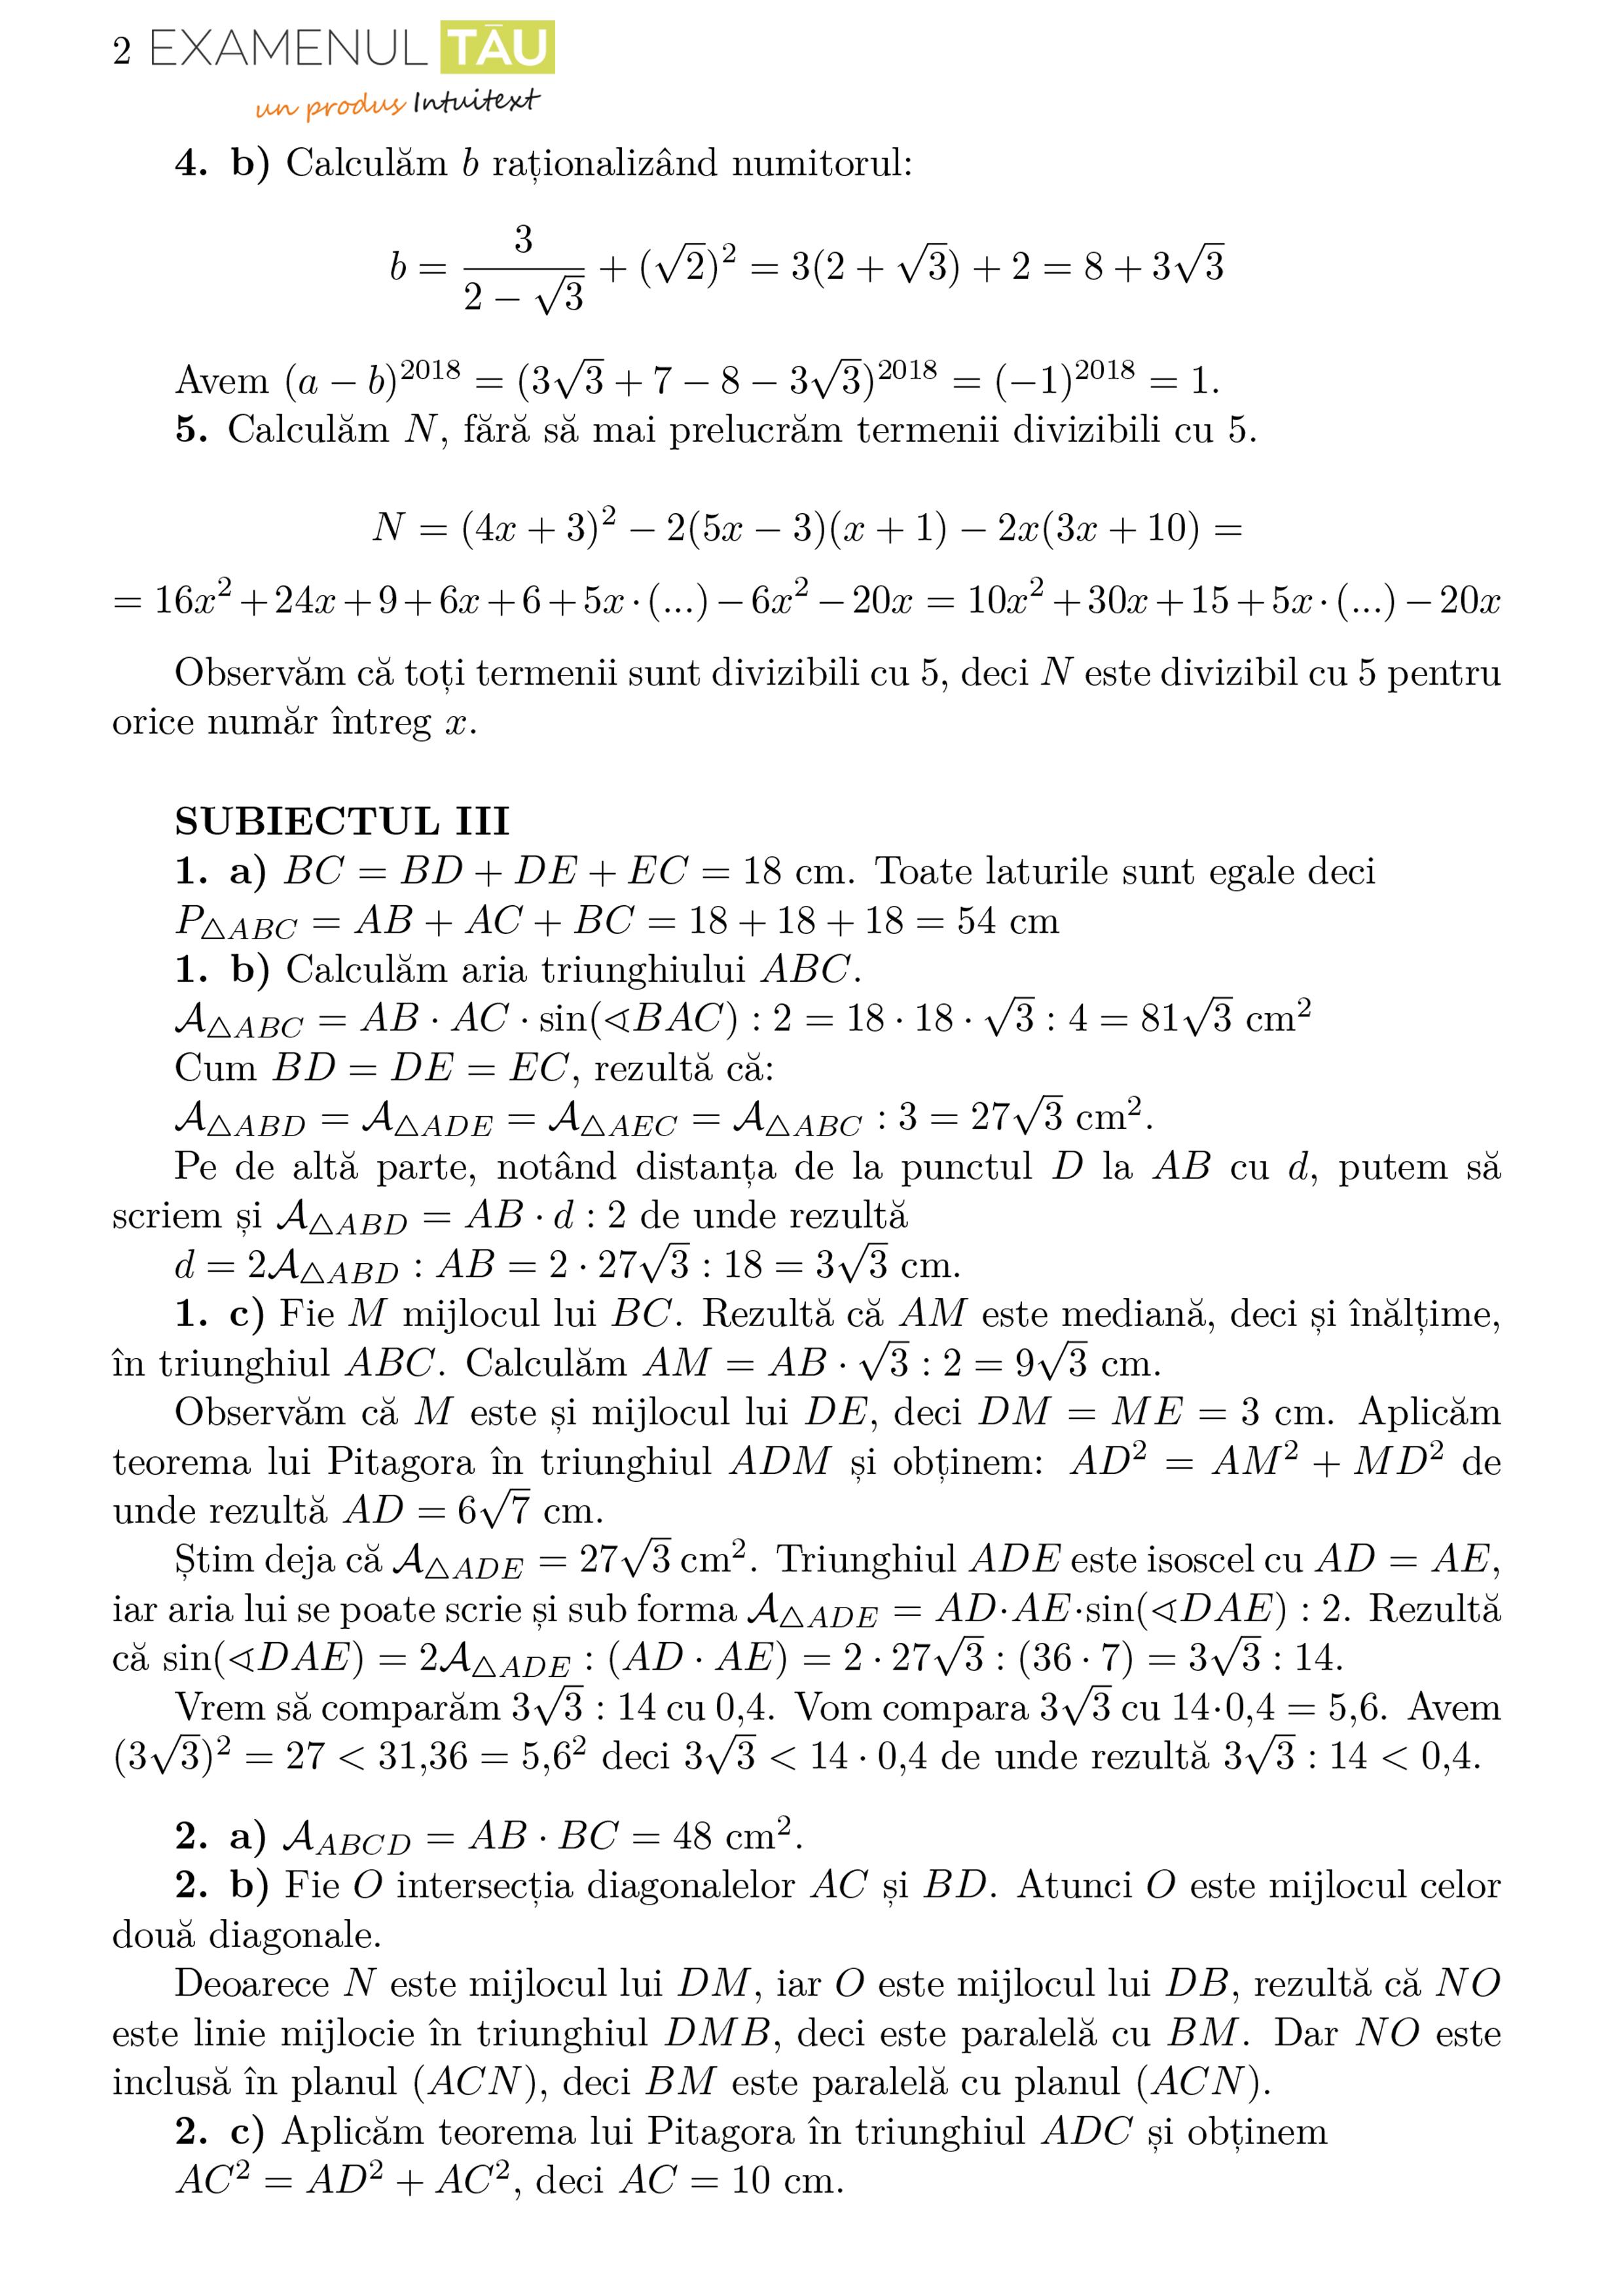 Rezolvari subiecte simulare Evaluare Nationala 2018 - proba la matematica (2)